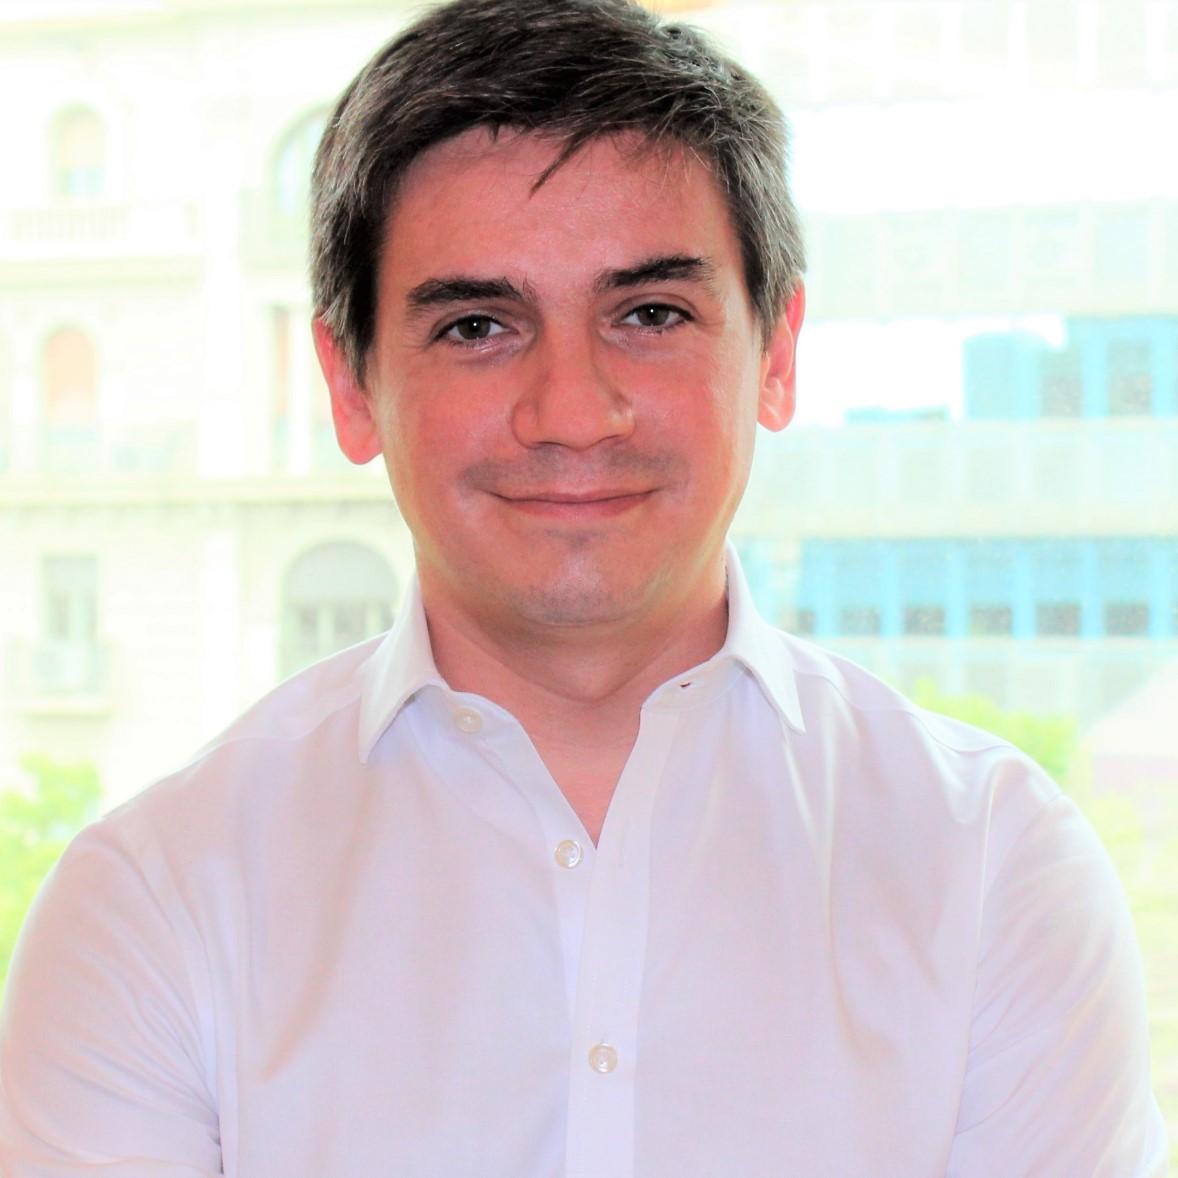 Luis Piacenza, COO, Crowe Spain